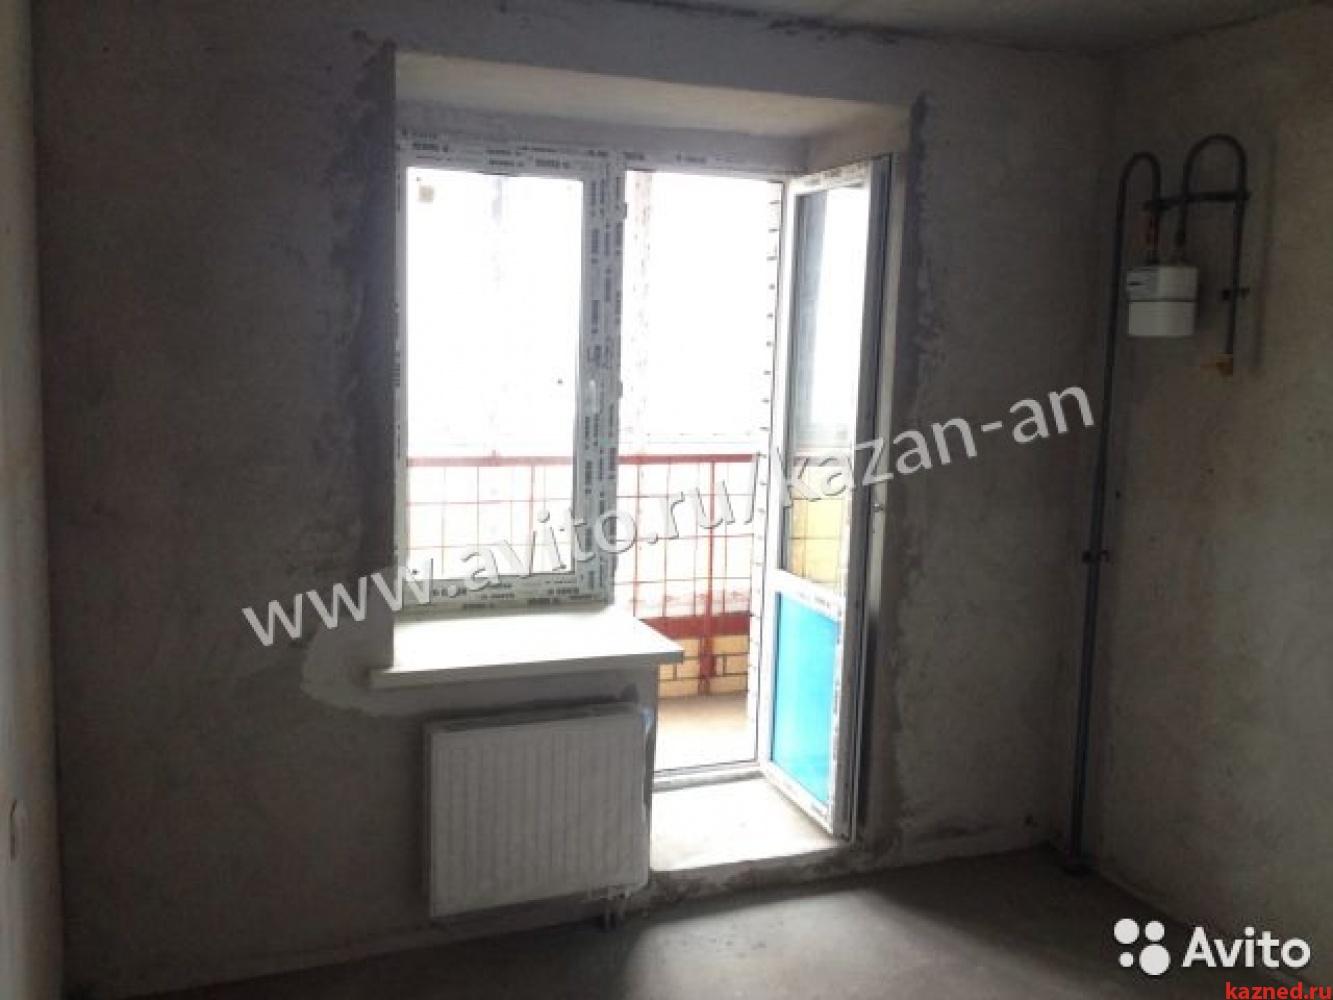 Продажа 1-к квартиры Лядова д15, 44 м² (миниатюра №7)